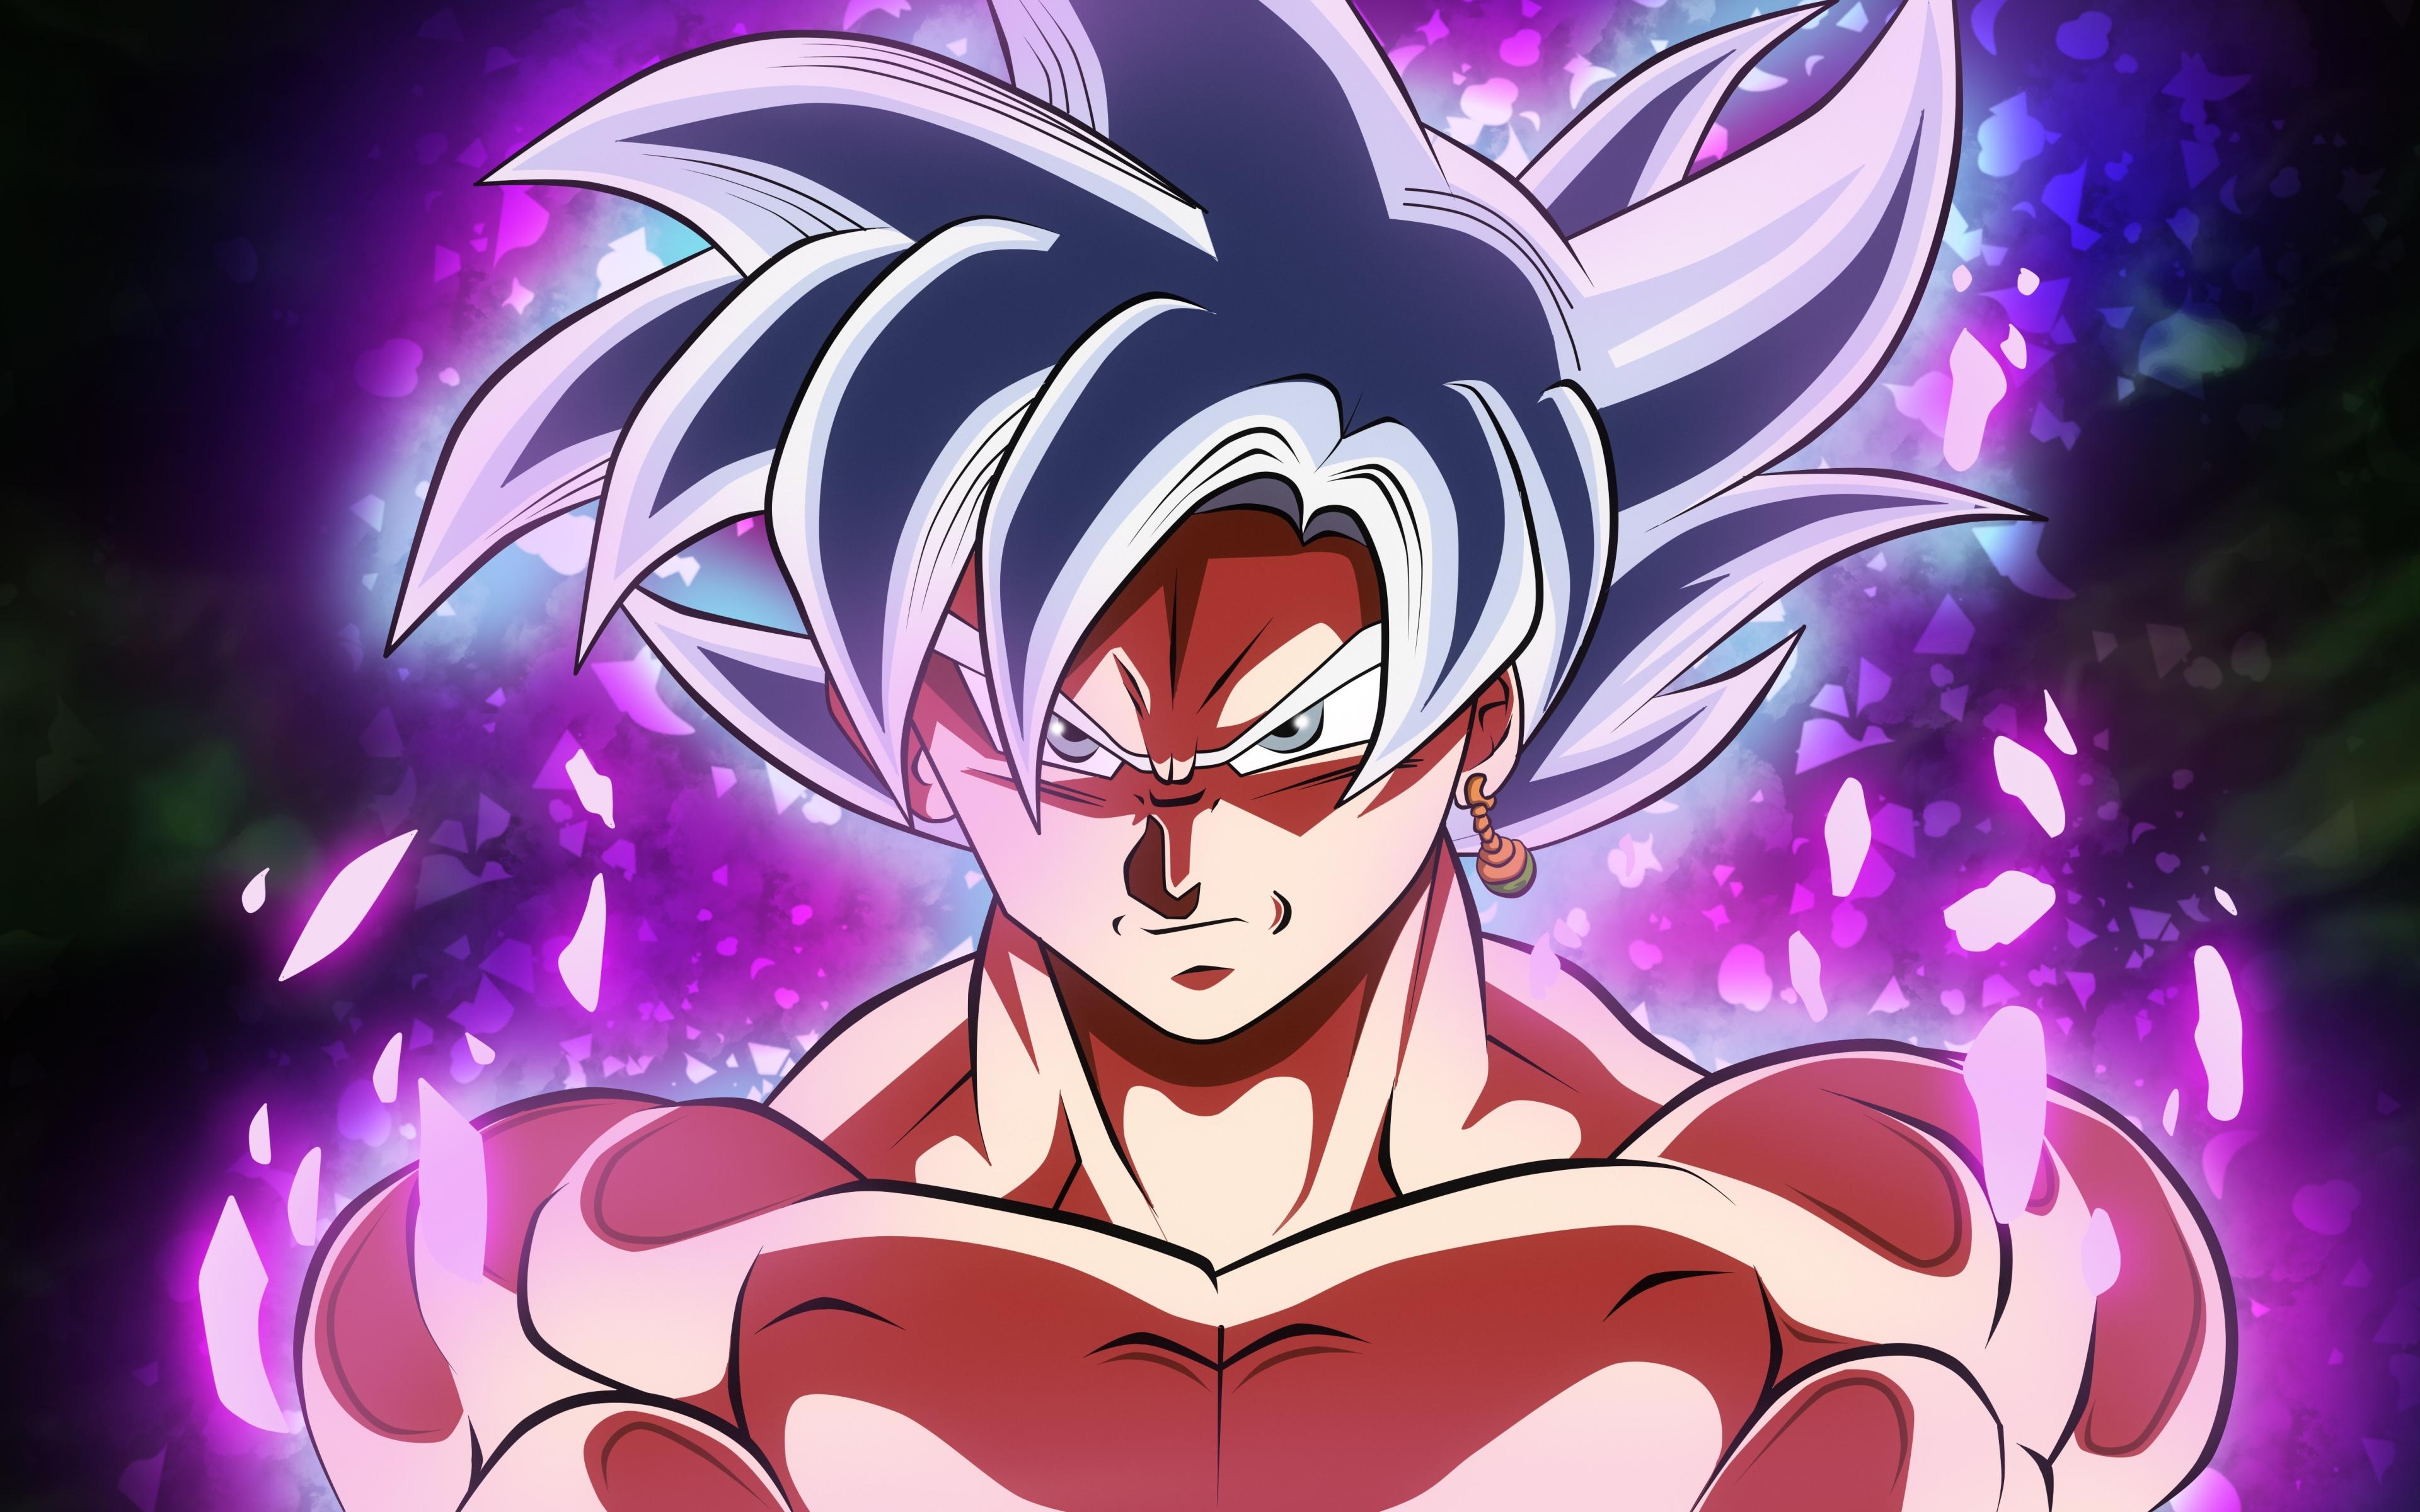 Download 3840x2400 Wallpaper Goku Black White Hair Dragon Ball Super 4k Ultra Hd 16 10 Widescreen 3840x2400 Hd Image Background 8708